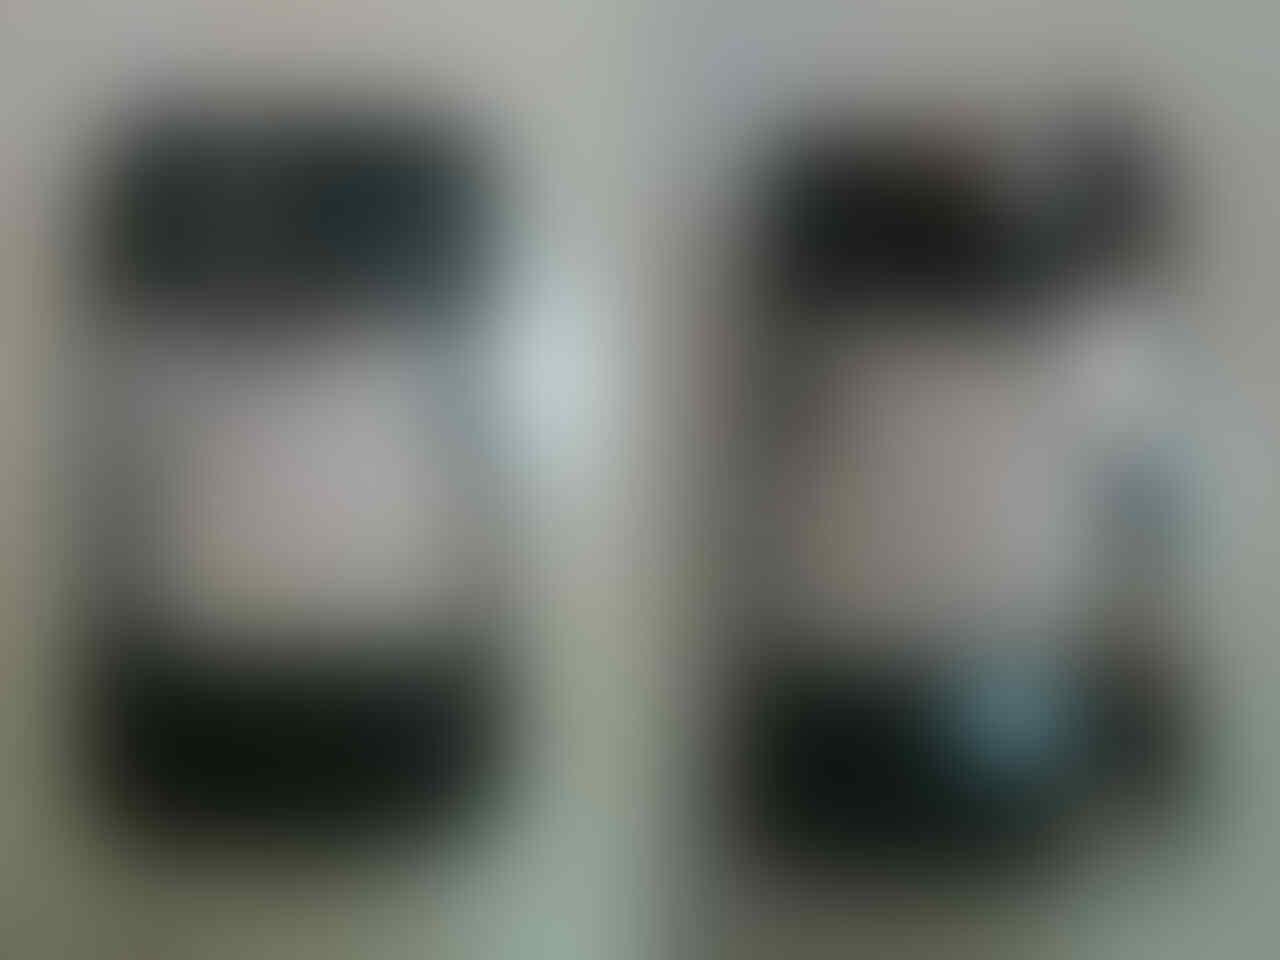 Sparepart Xperia Mini Pro (SK17i)